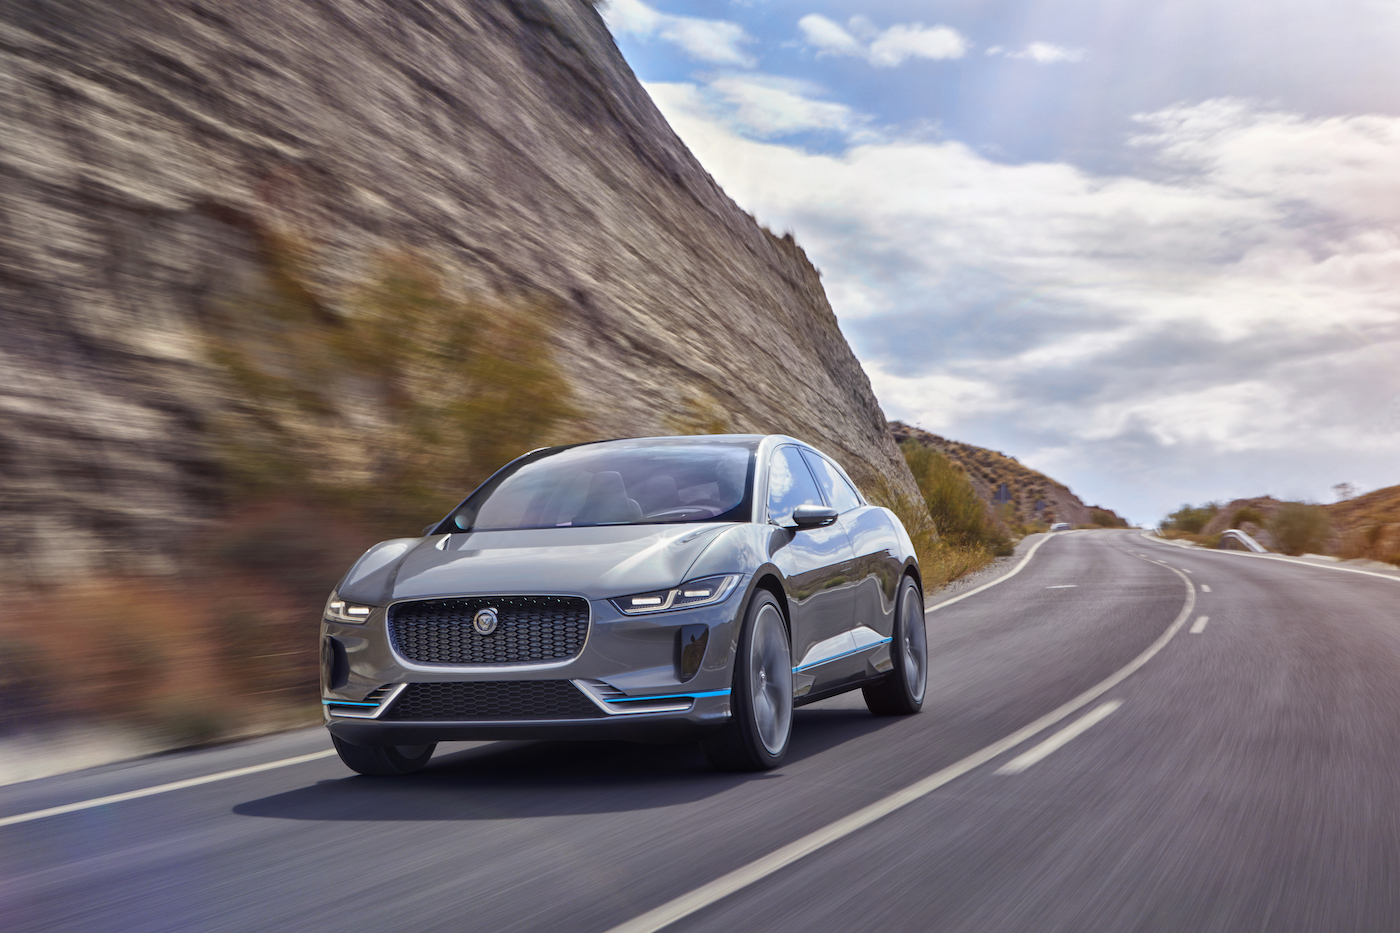 Der neue i-Pace: So will Jaguar Tesla & Co. angreifen 1